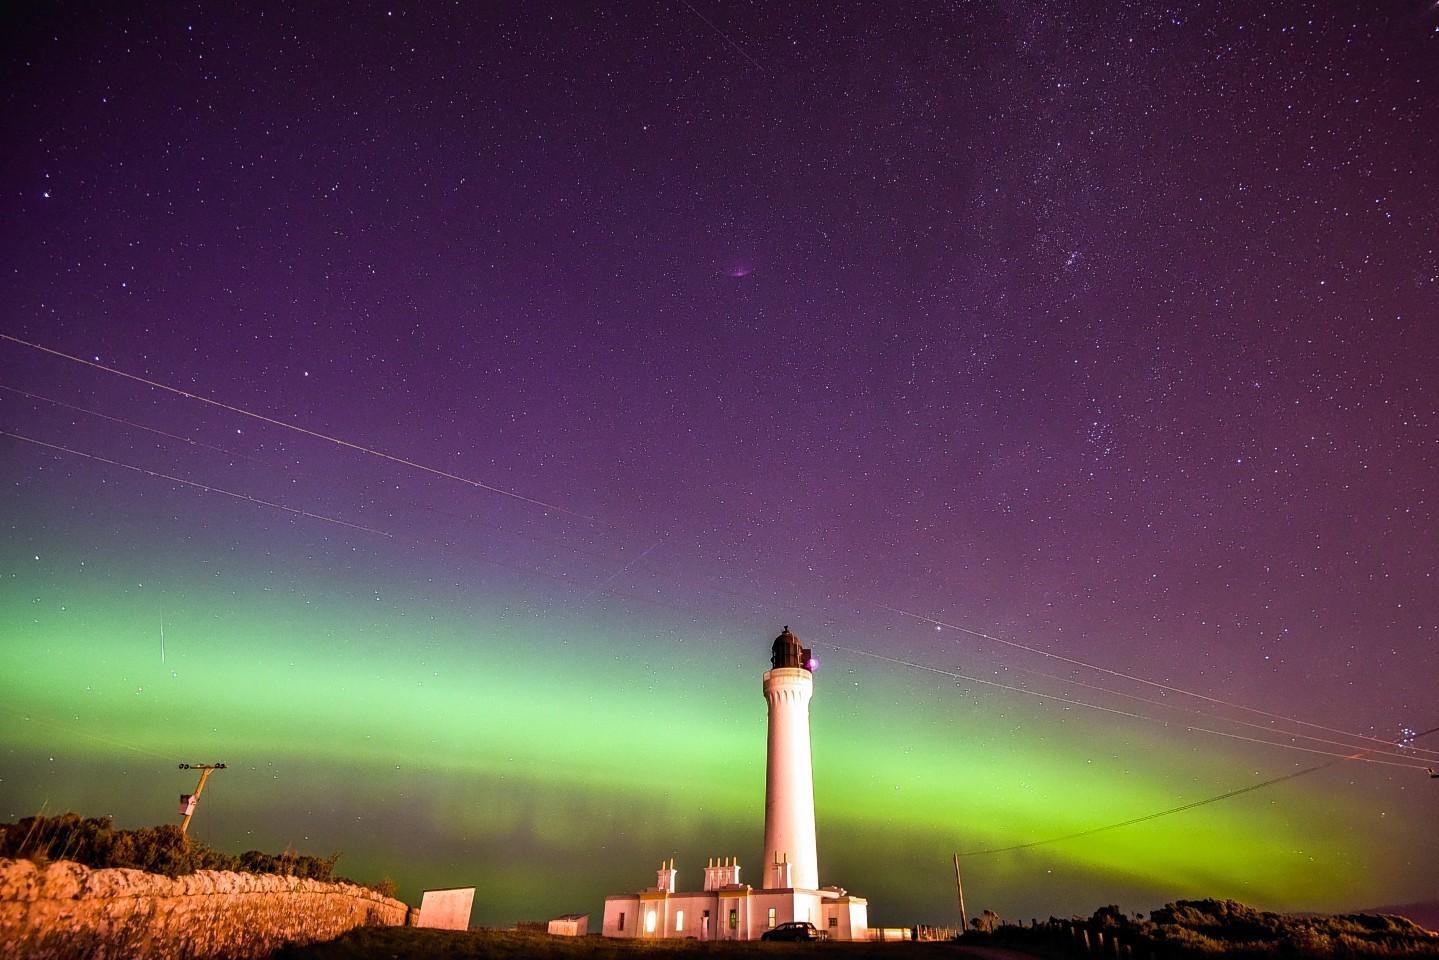 Covesea Lighthouse near Lossiemouth, Moray is set against the Aurora Borealis,